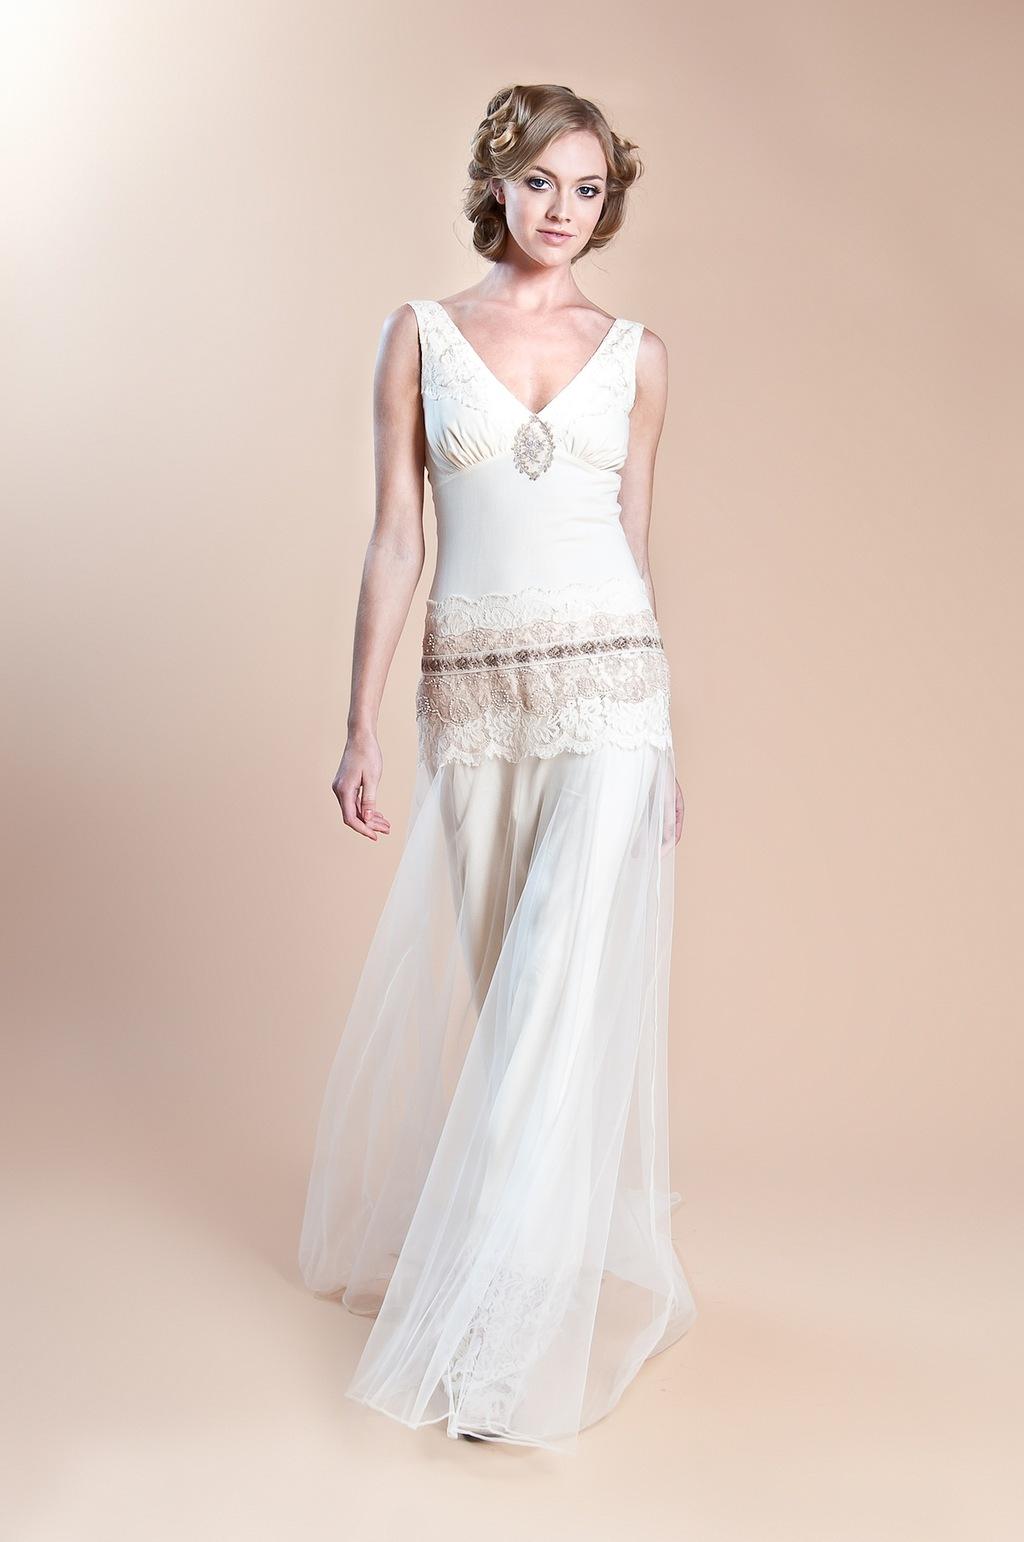 2013-wedding-dress-claire-pettibone-windsor-rose-collection-haviland.full